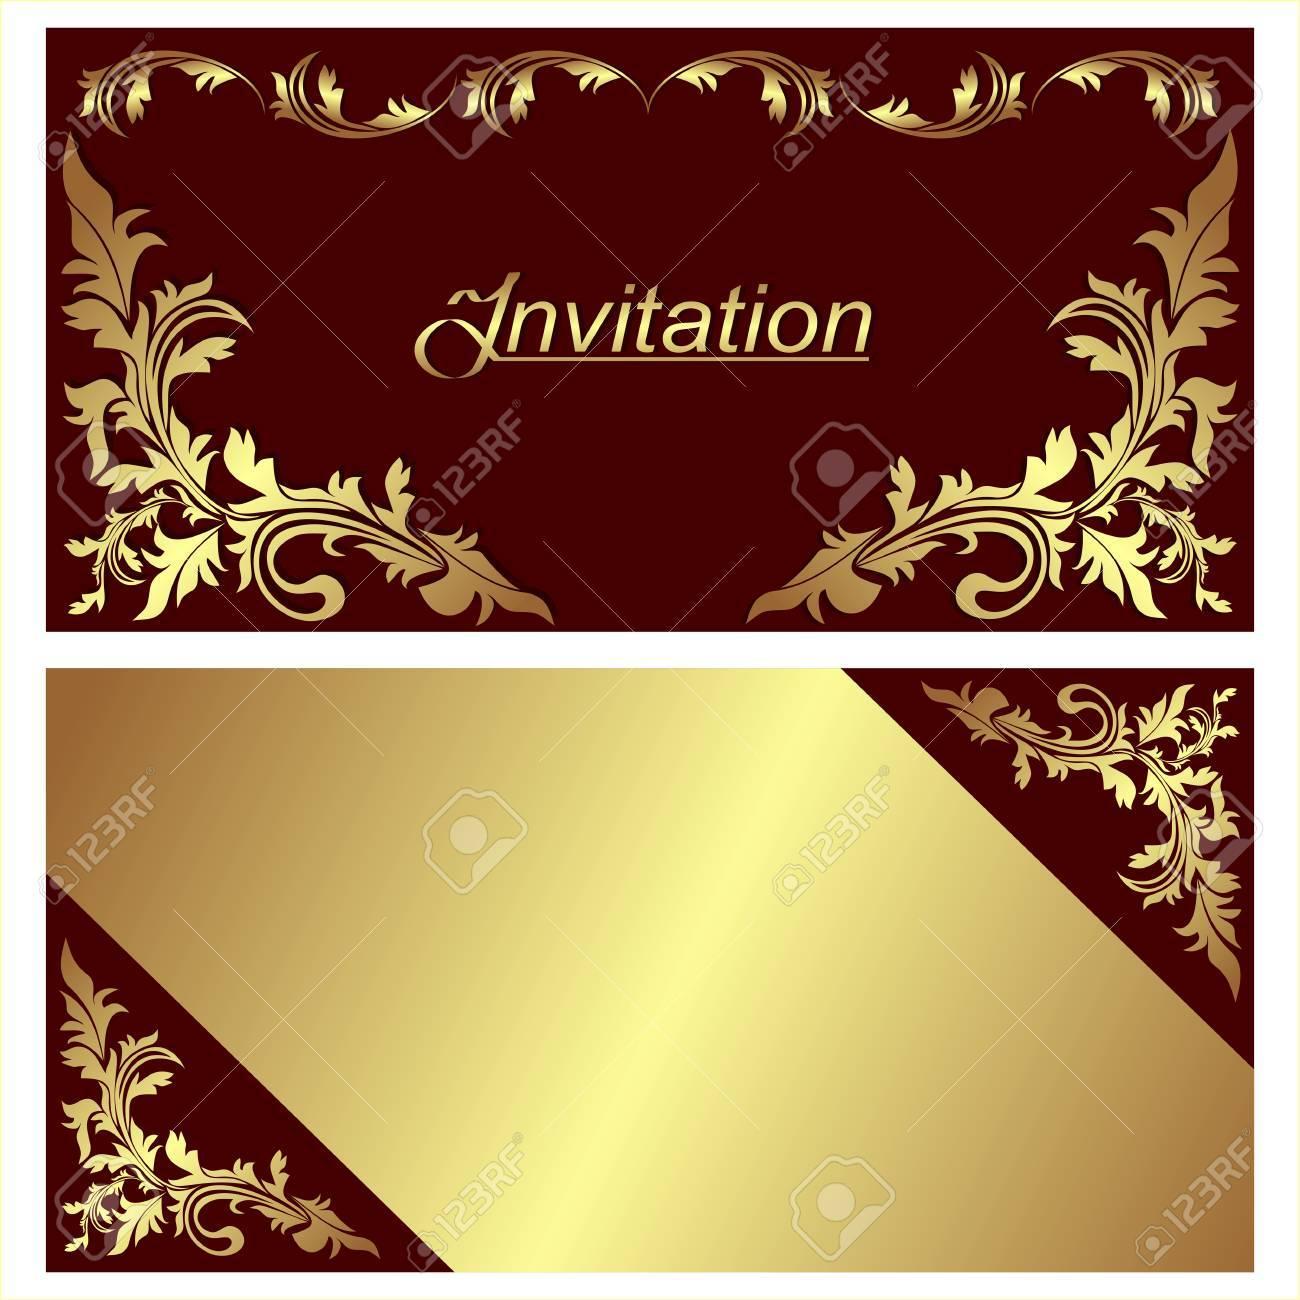 Invitation Card Design With Golden Borders